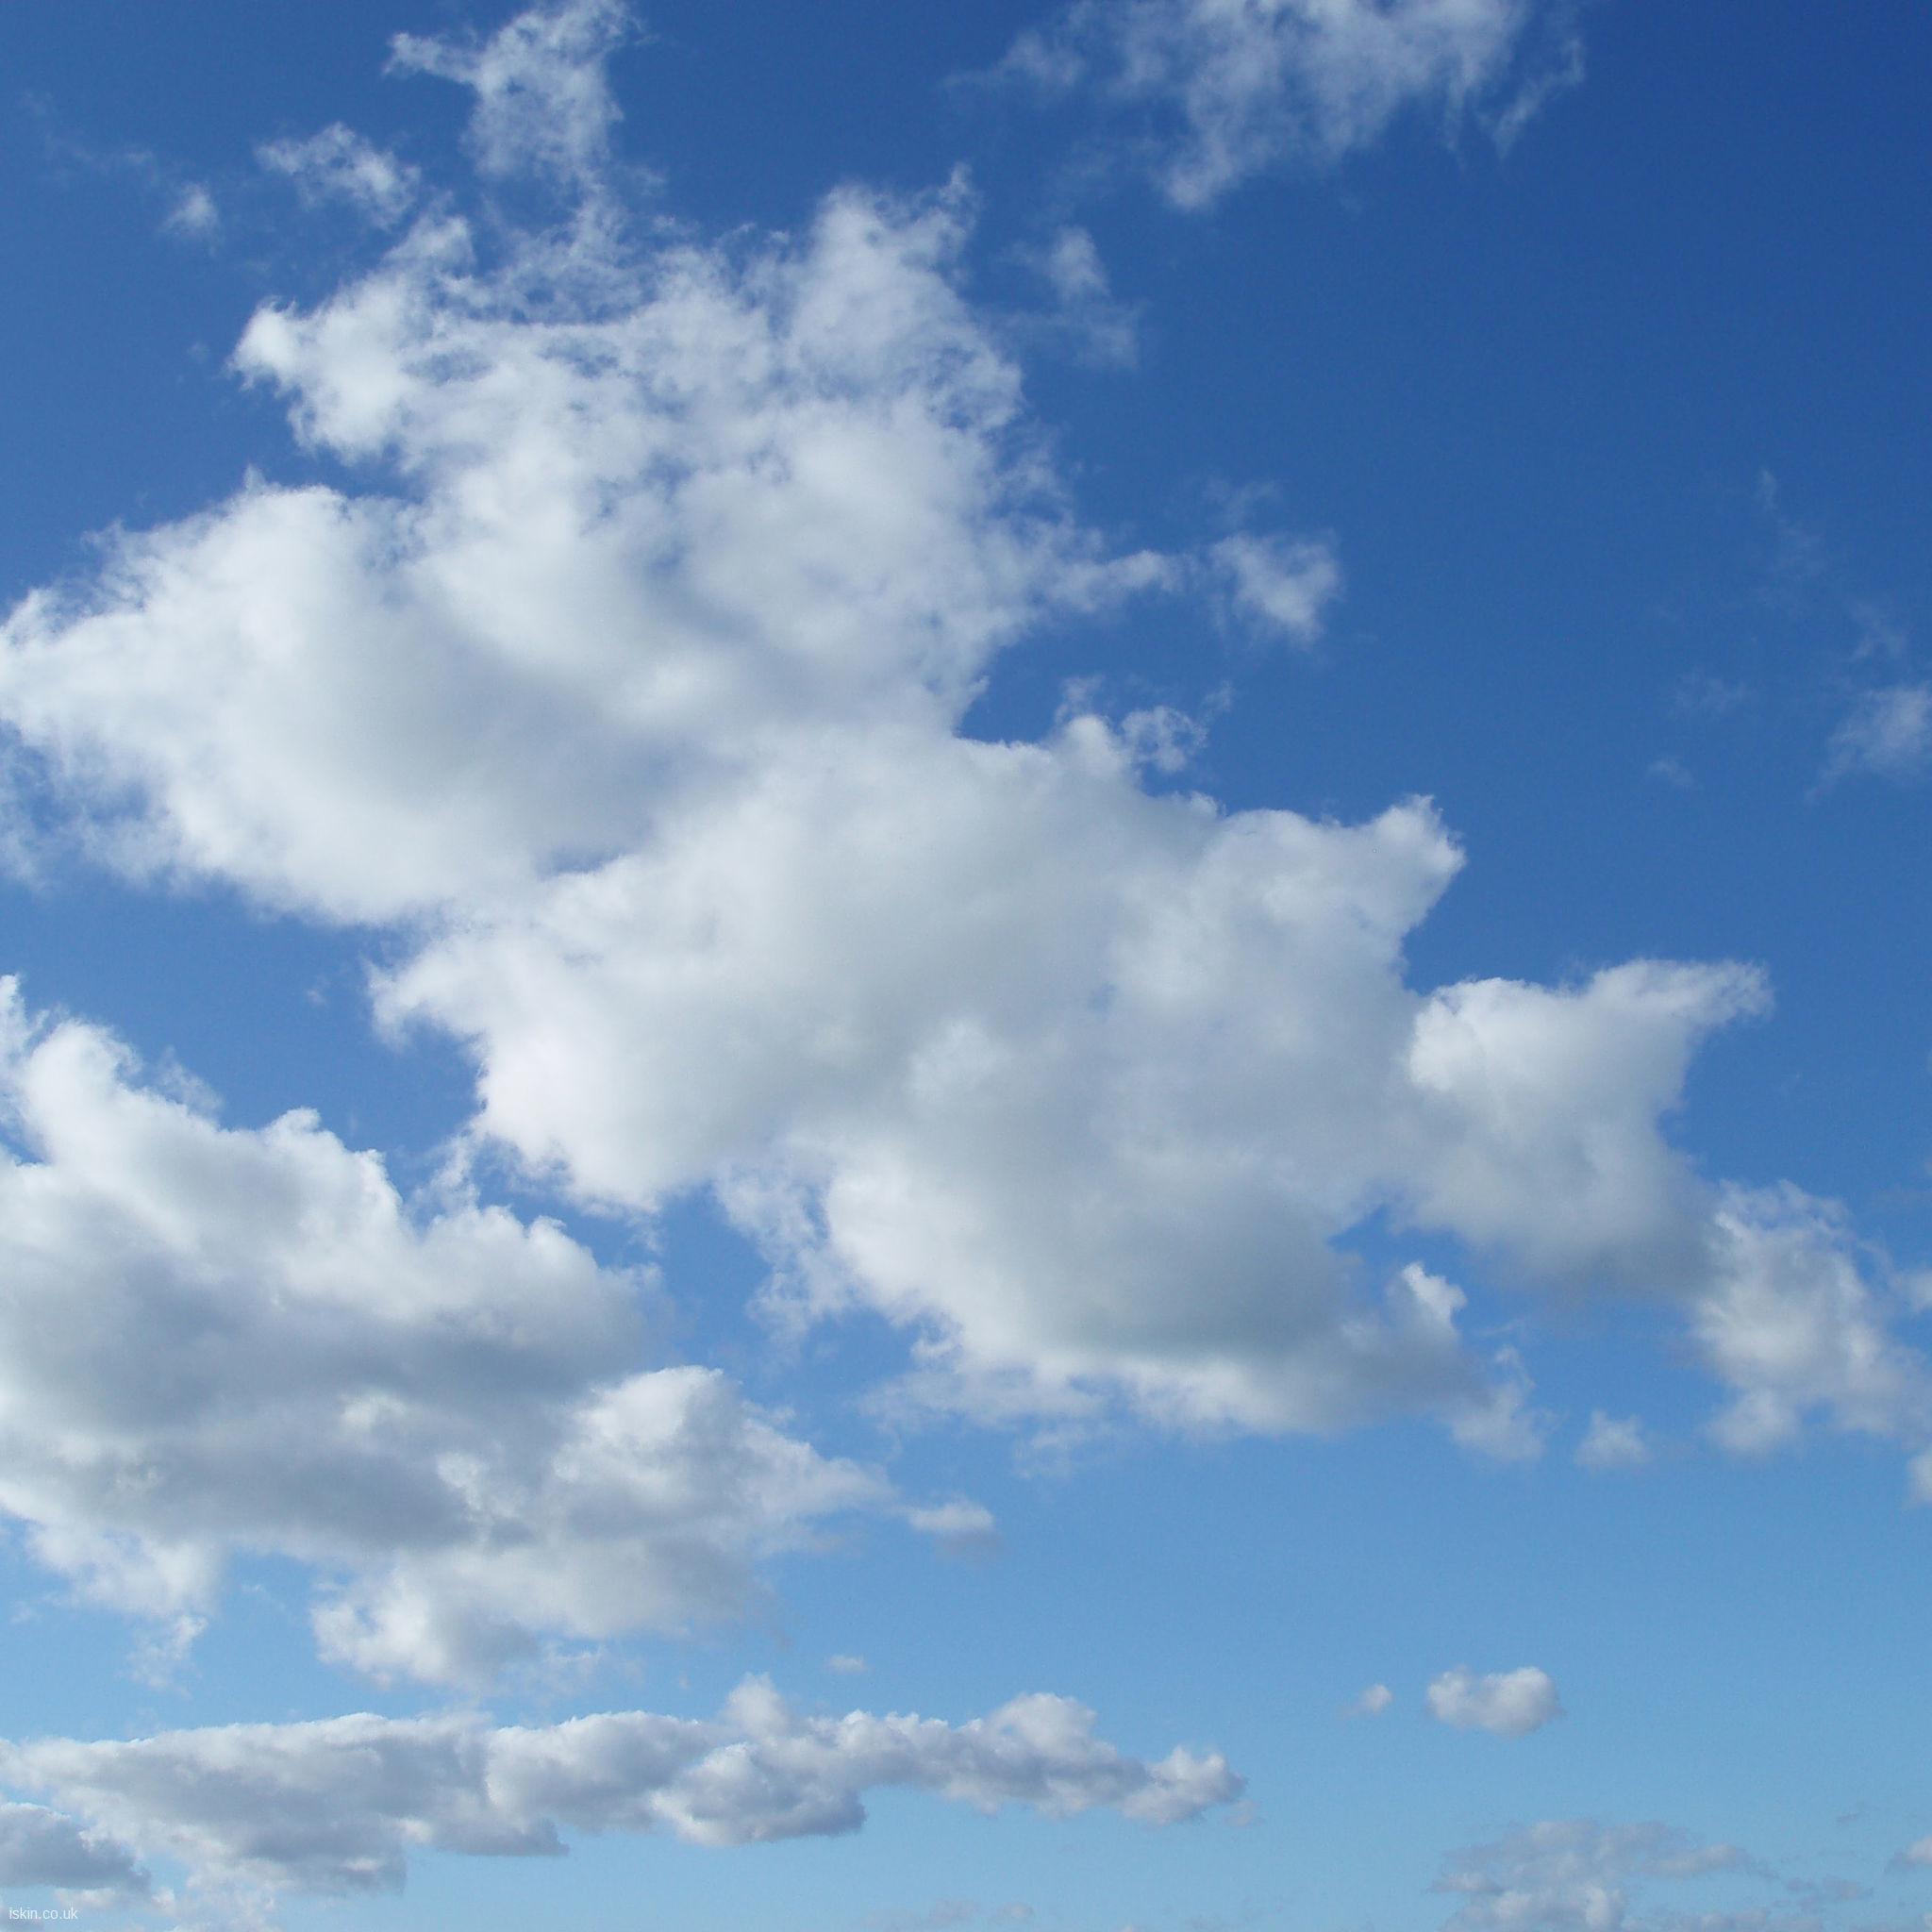 Cloud Wallpaper Hd: Cloudy Sky Wallpaper (66+ Images